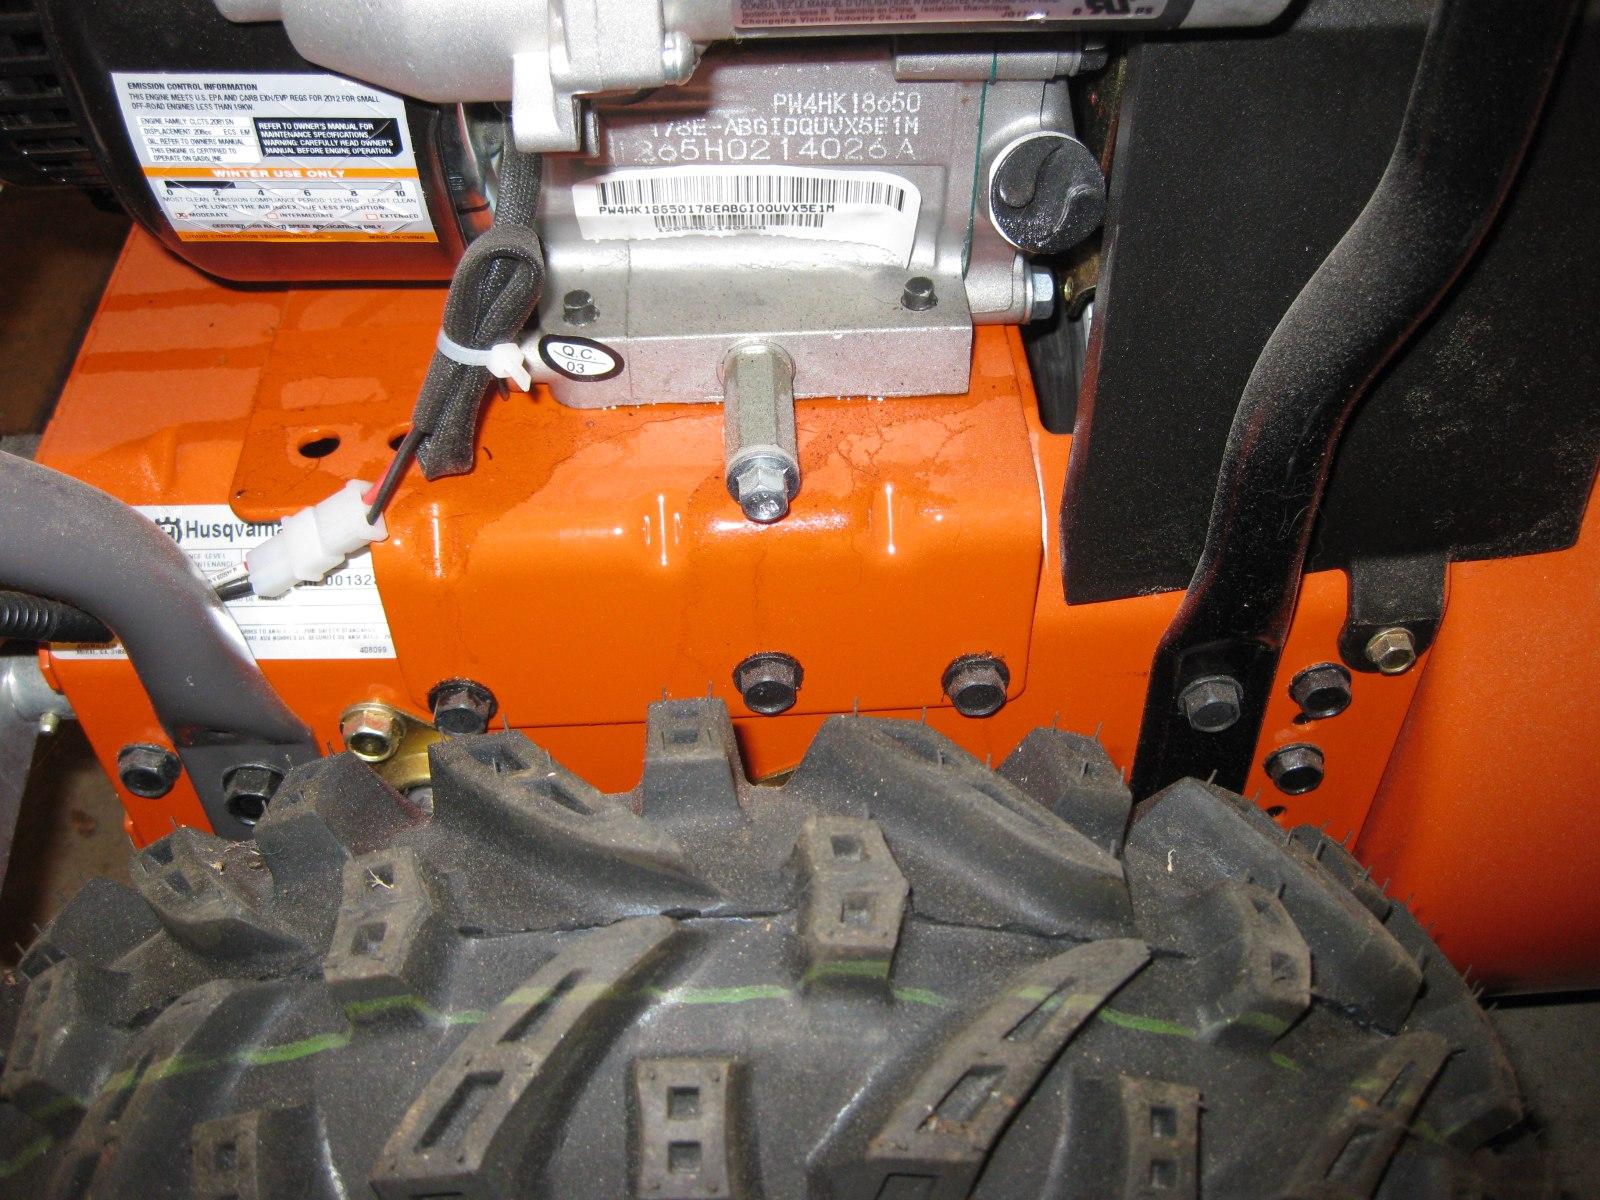 Husqvarna Snow Blowers Shaft Drive : Changing the oil wheel maintenance drive shaft